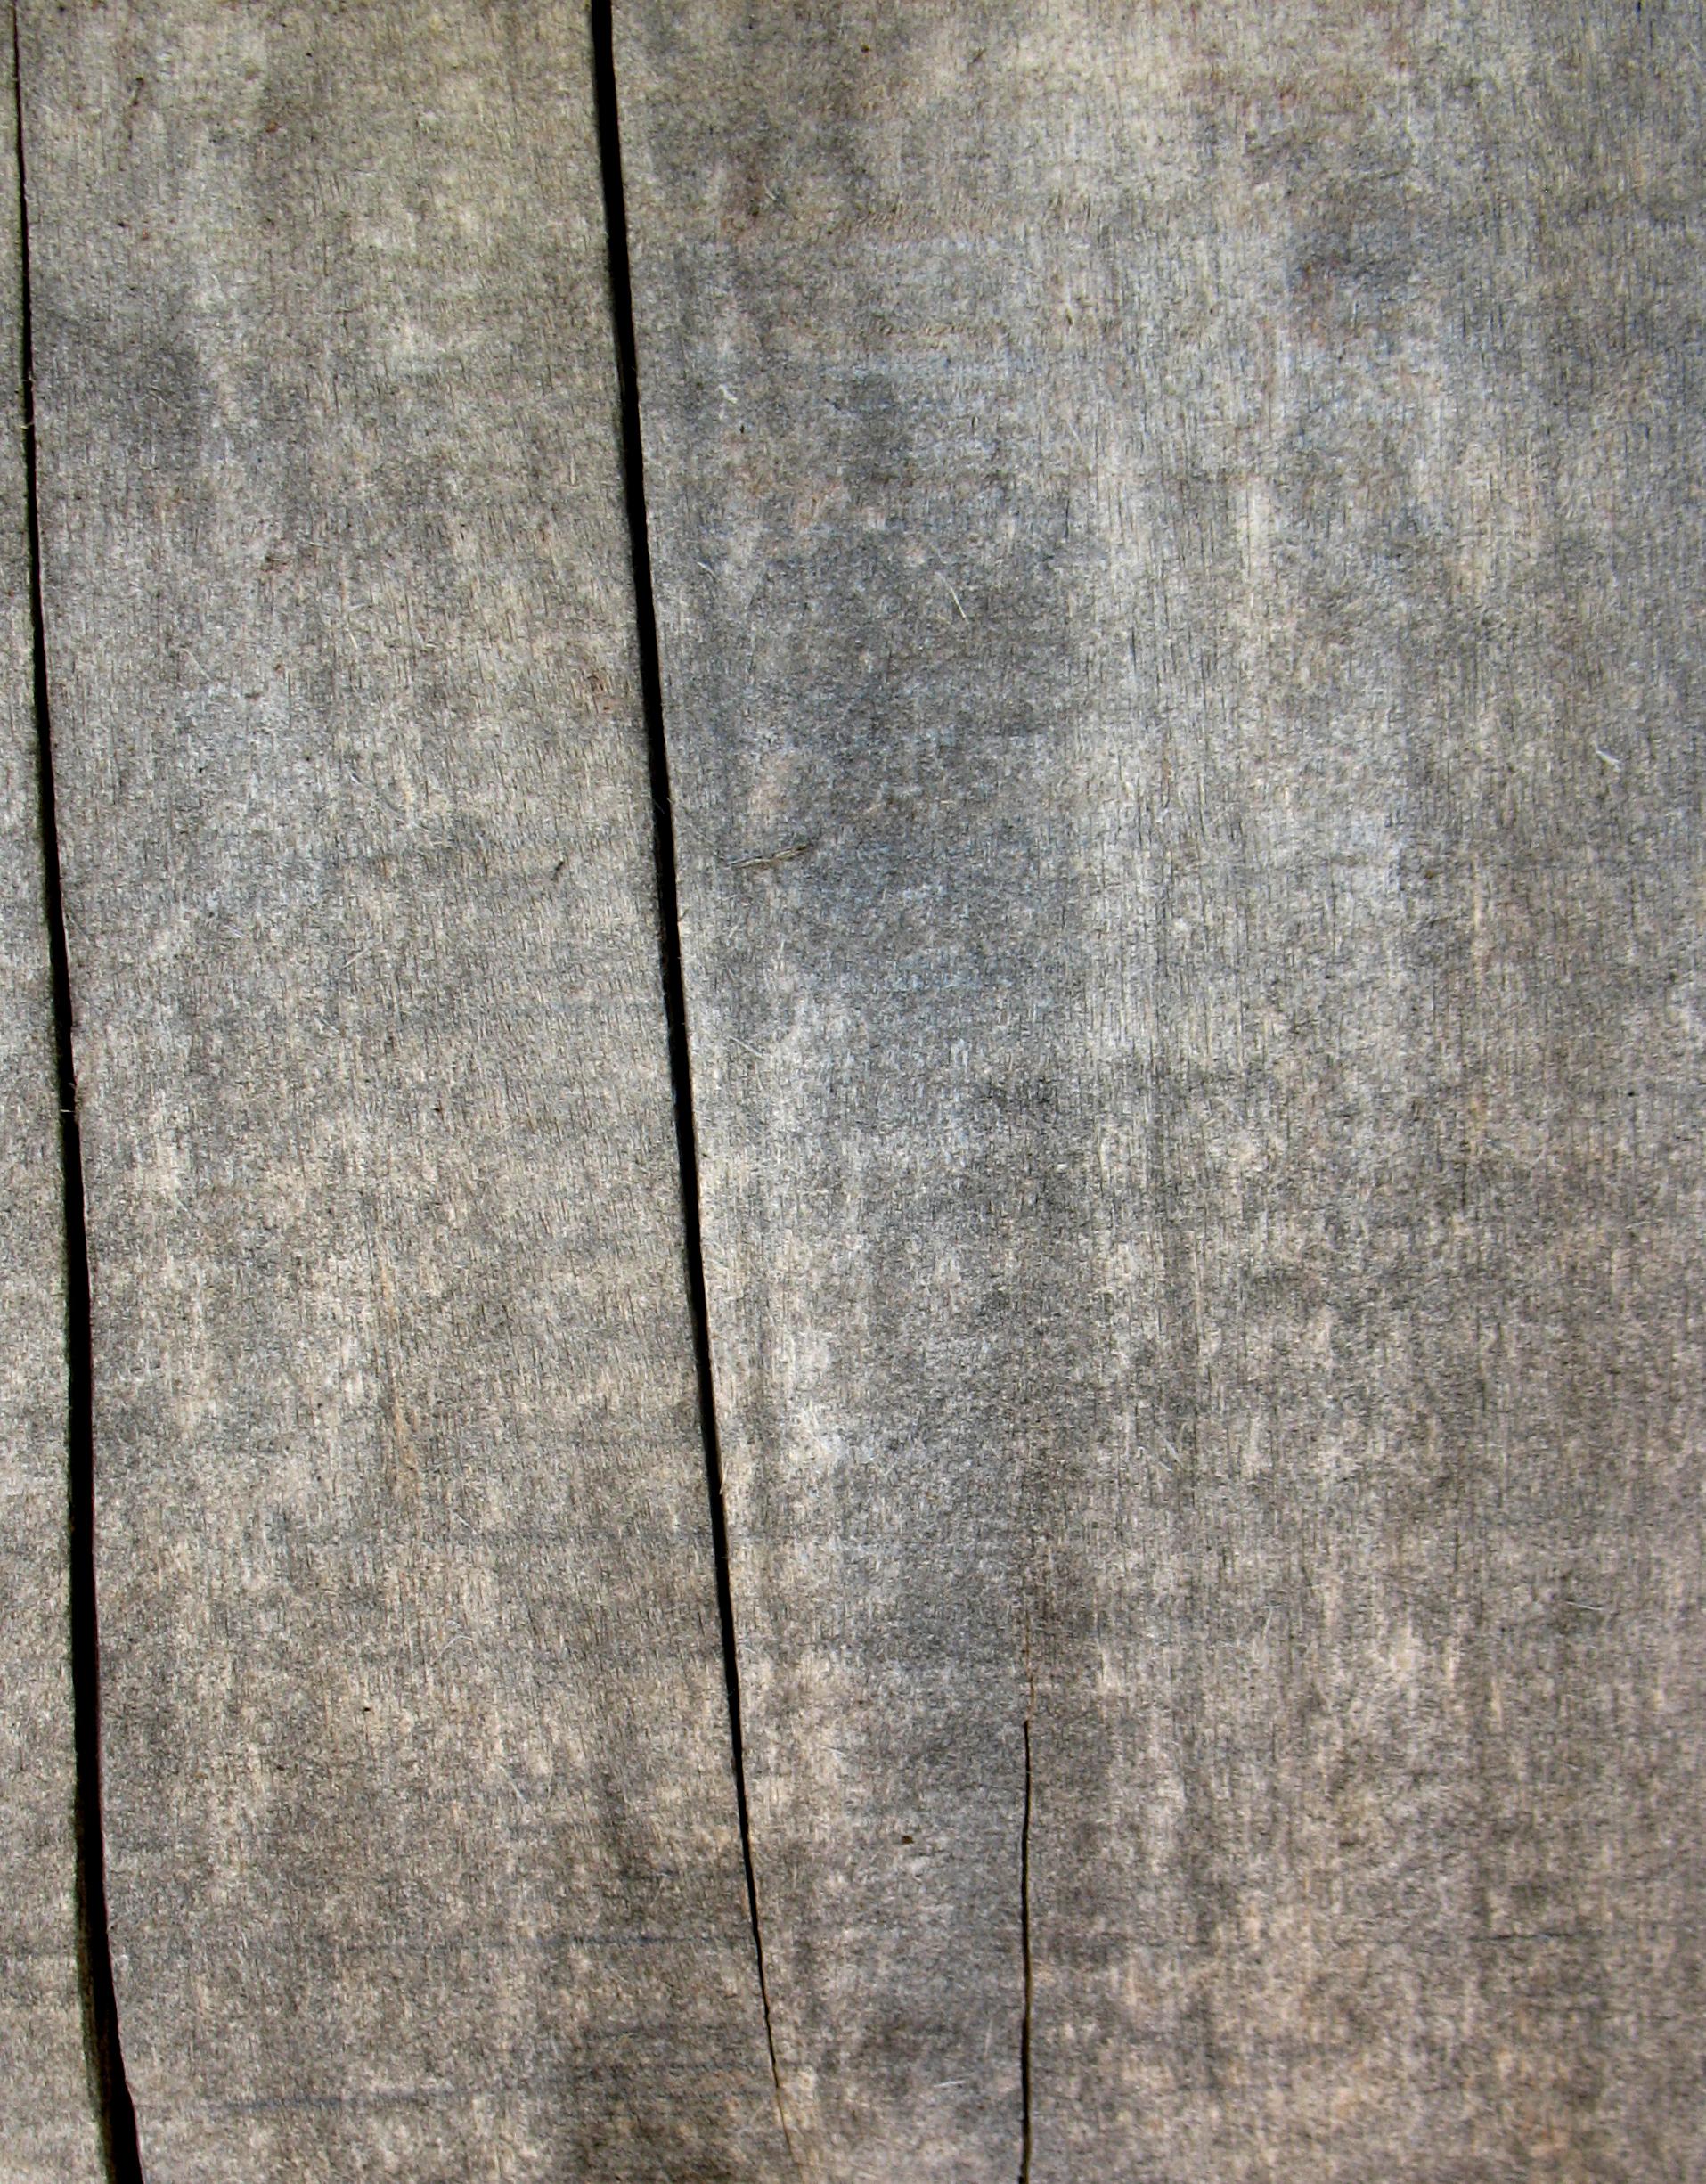 Wood Texture, Board, Cracked, Freetexturefrida, Grunge, HQ Photo